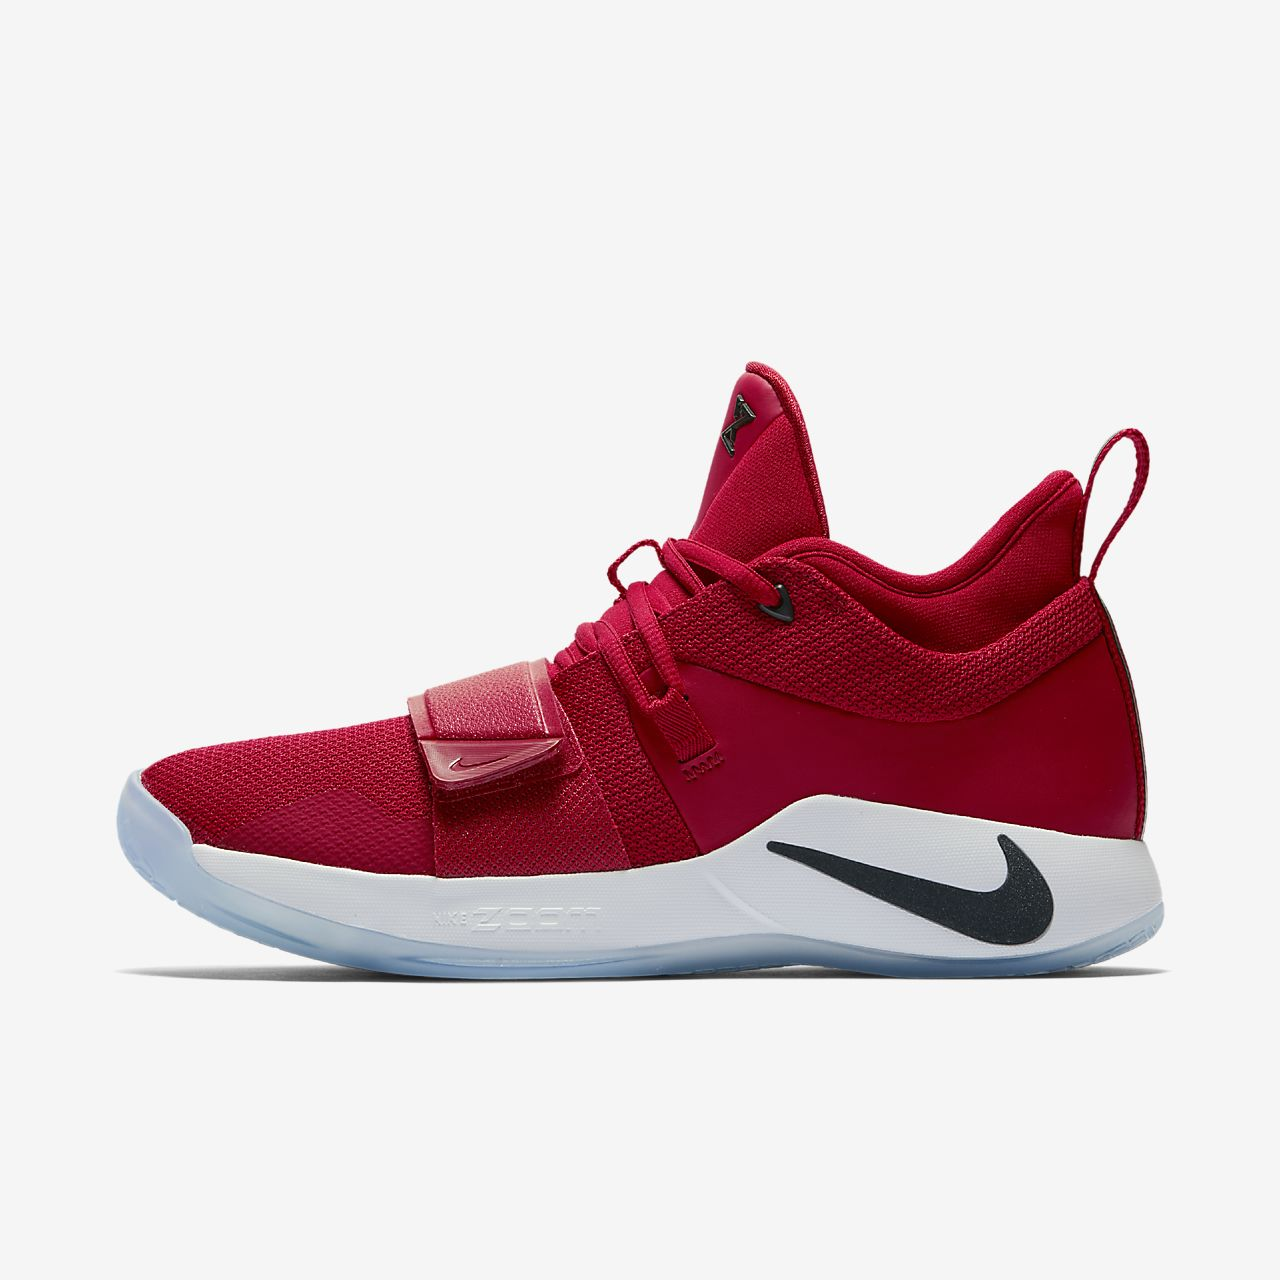 37bca00987911 ... rouge noir blanc  0862b 1f3b0 Chaussure de basketball PG 2.5  850f9  3832d Shoes Nike PG 2 ...